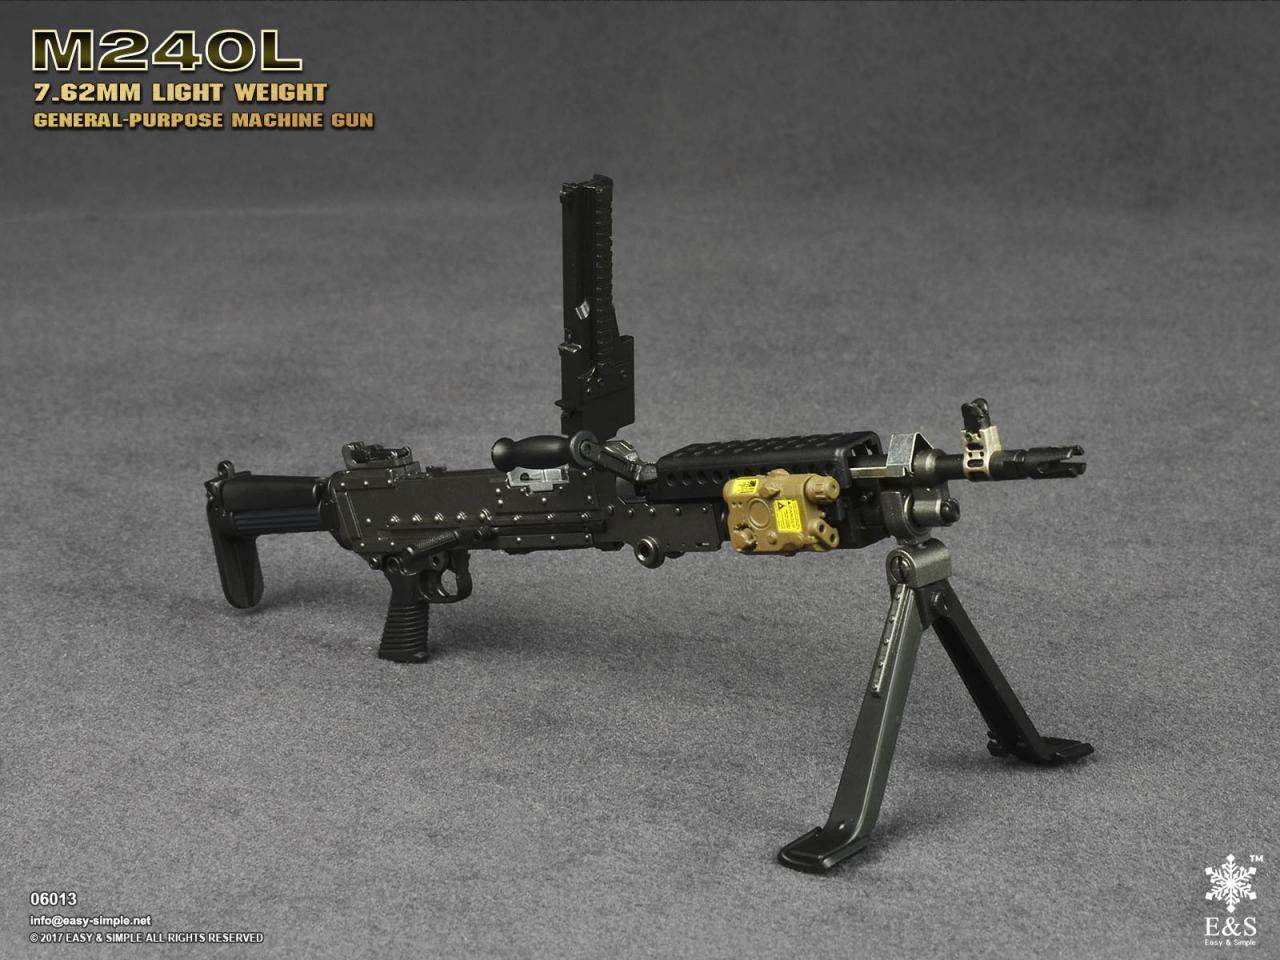 Easy&Simple 06013 M240L 7.62mm Light Weight General Purpose Machine Gun-06013-11-jpg